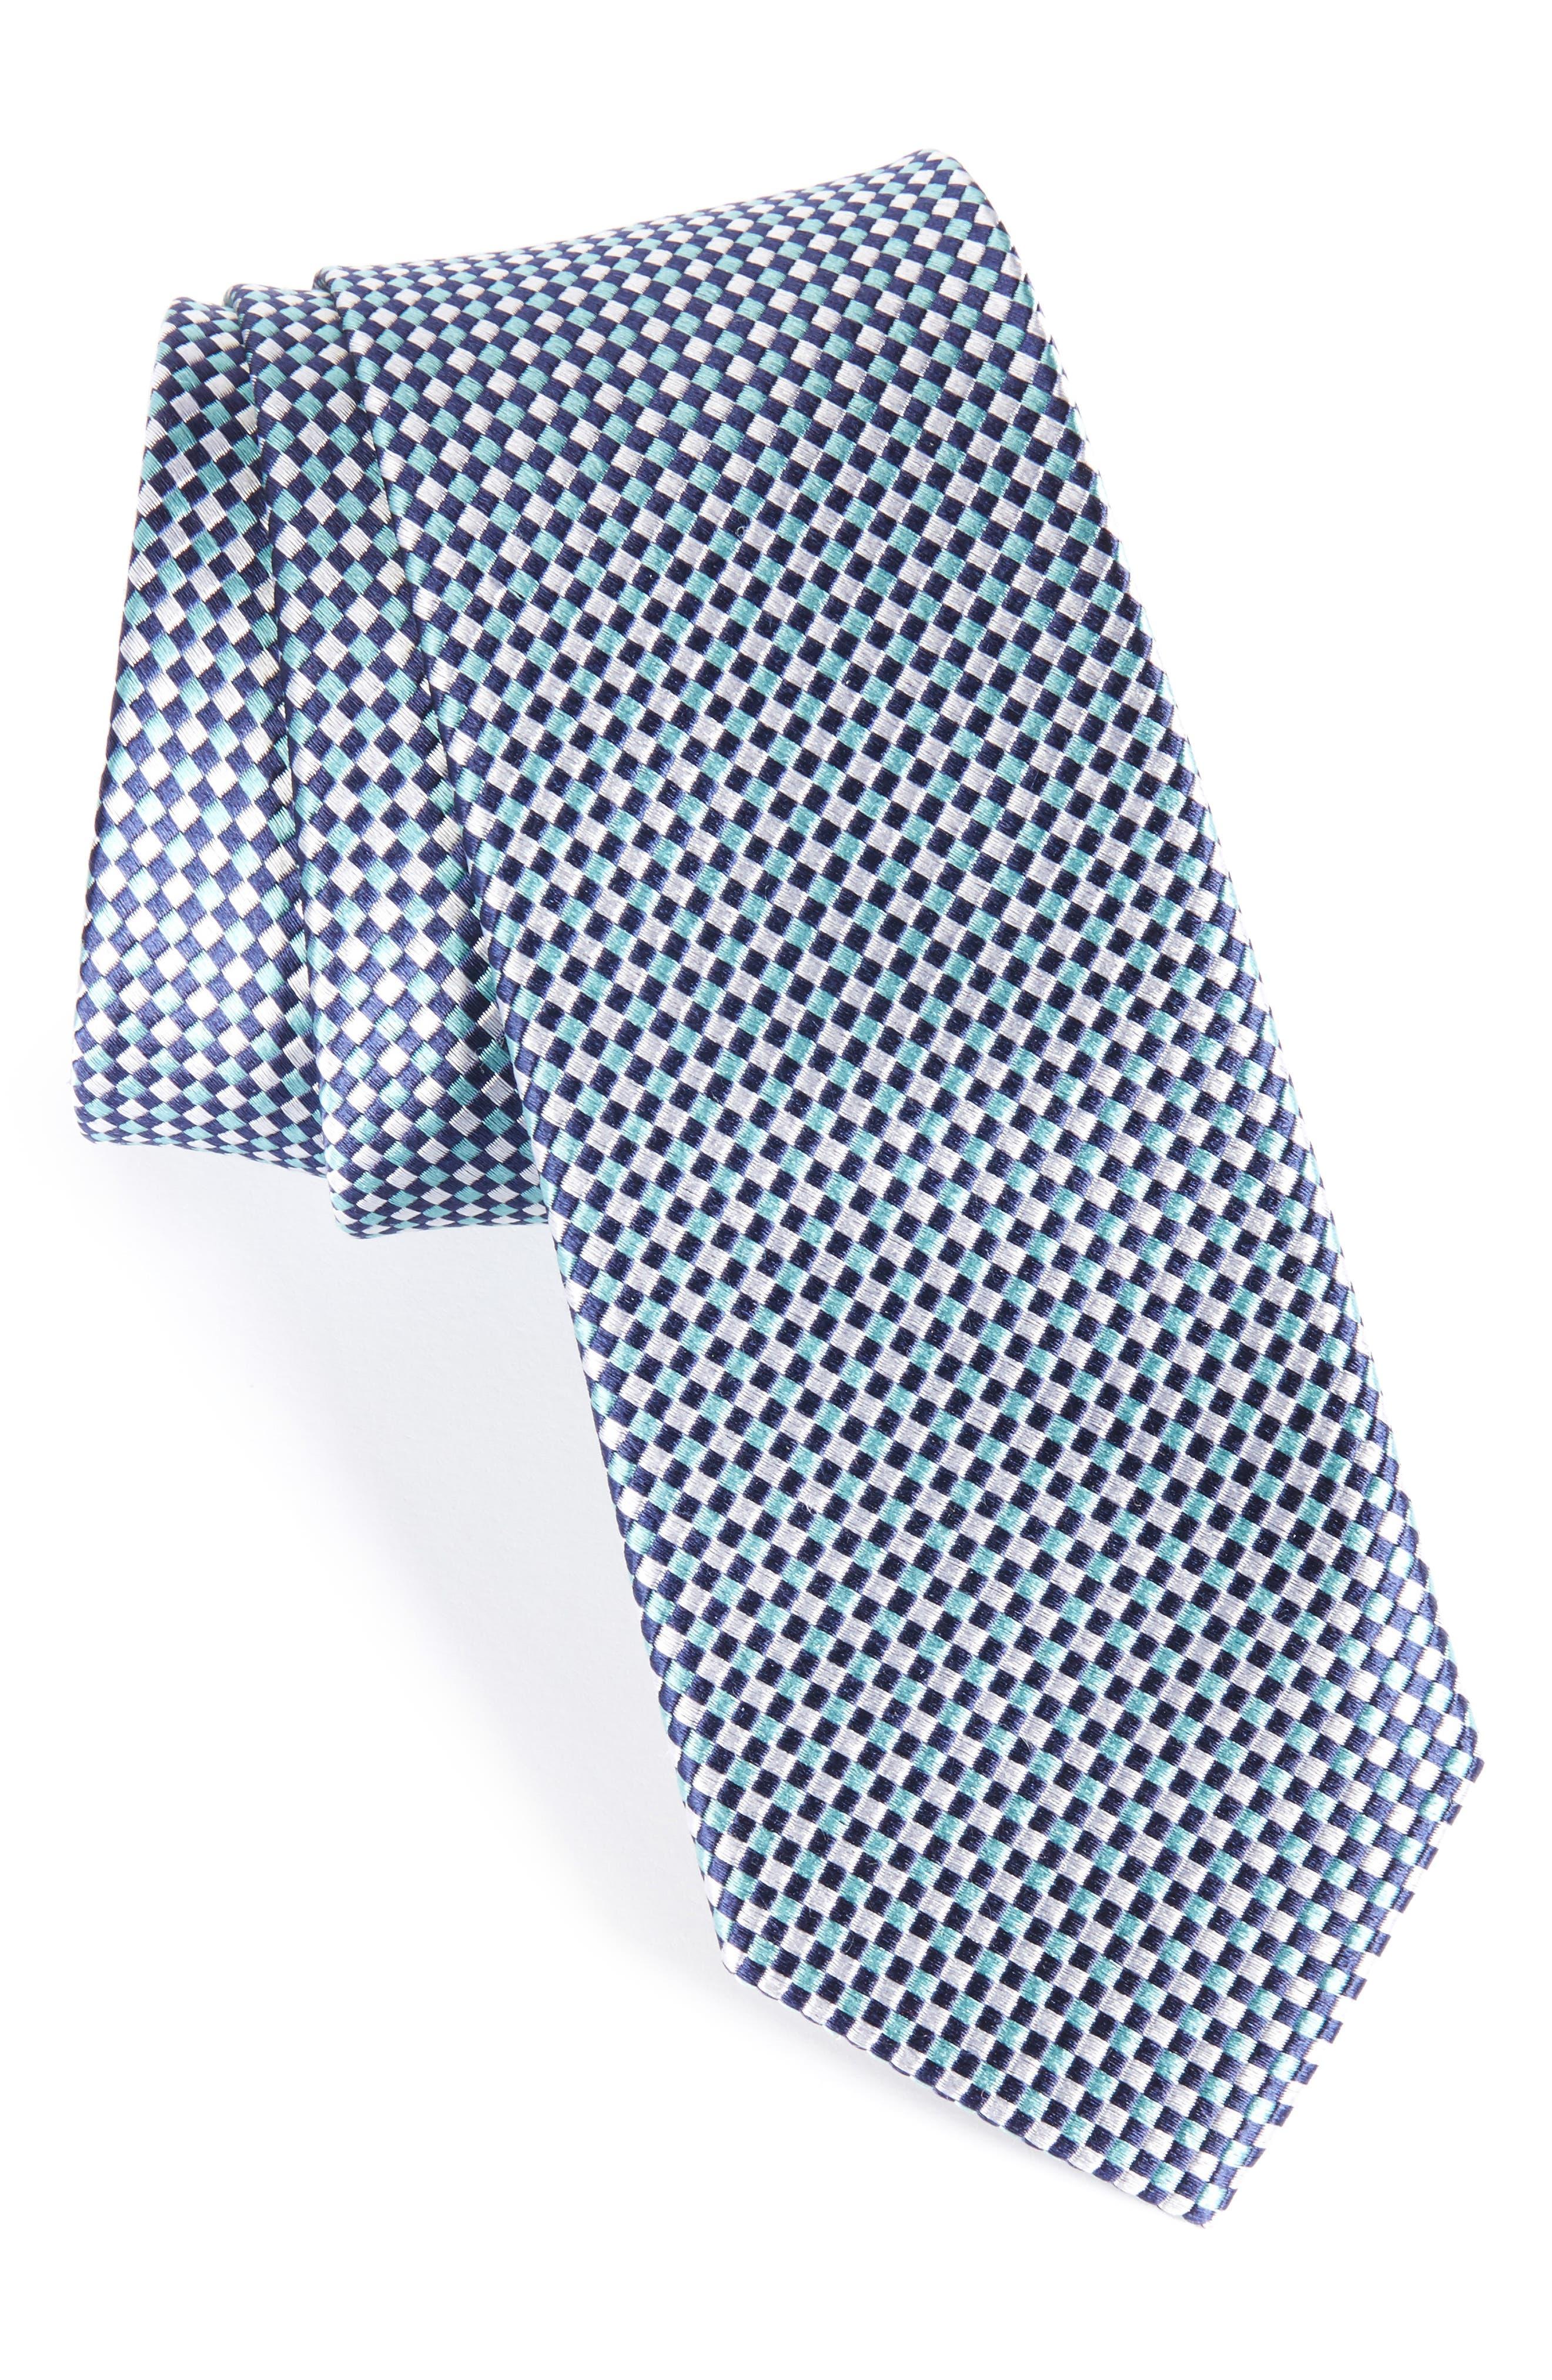 NORDSTROM MEN'S SHOP,                             Solid Silk Skinny Tie,                             Main thumbnail 1, color,                             450